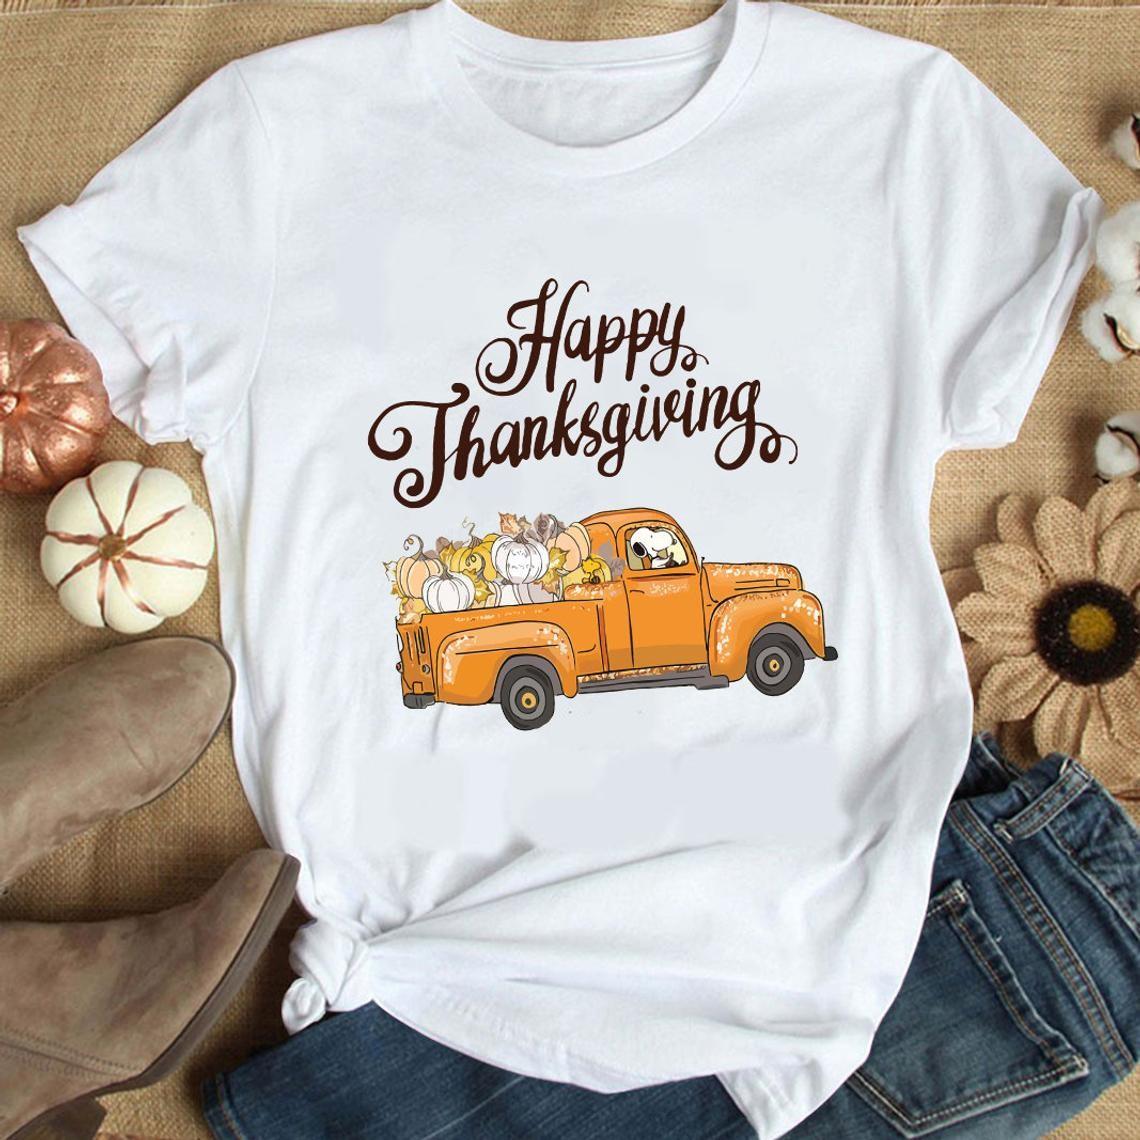 Snoopy Dog Shirt The Peanuts Movie Shirt The Peanuts Thanksgiving Shirt Thanksgiving Shirt Snoopy Thanksgiving Happy Thanksgiving